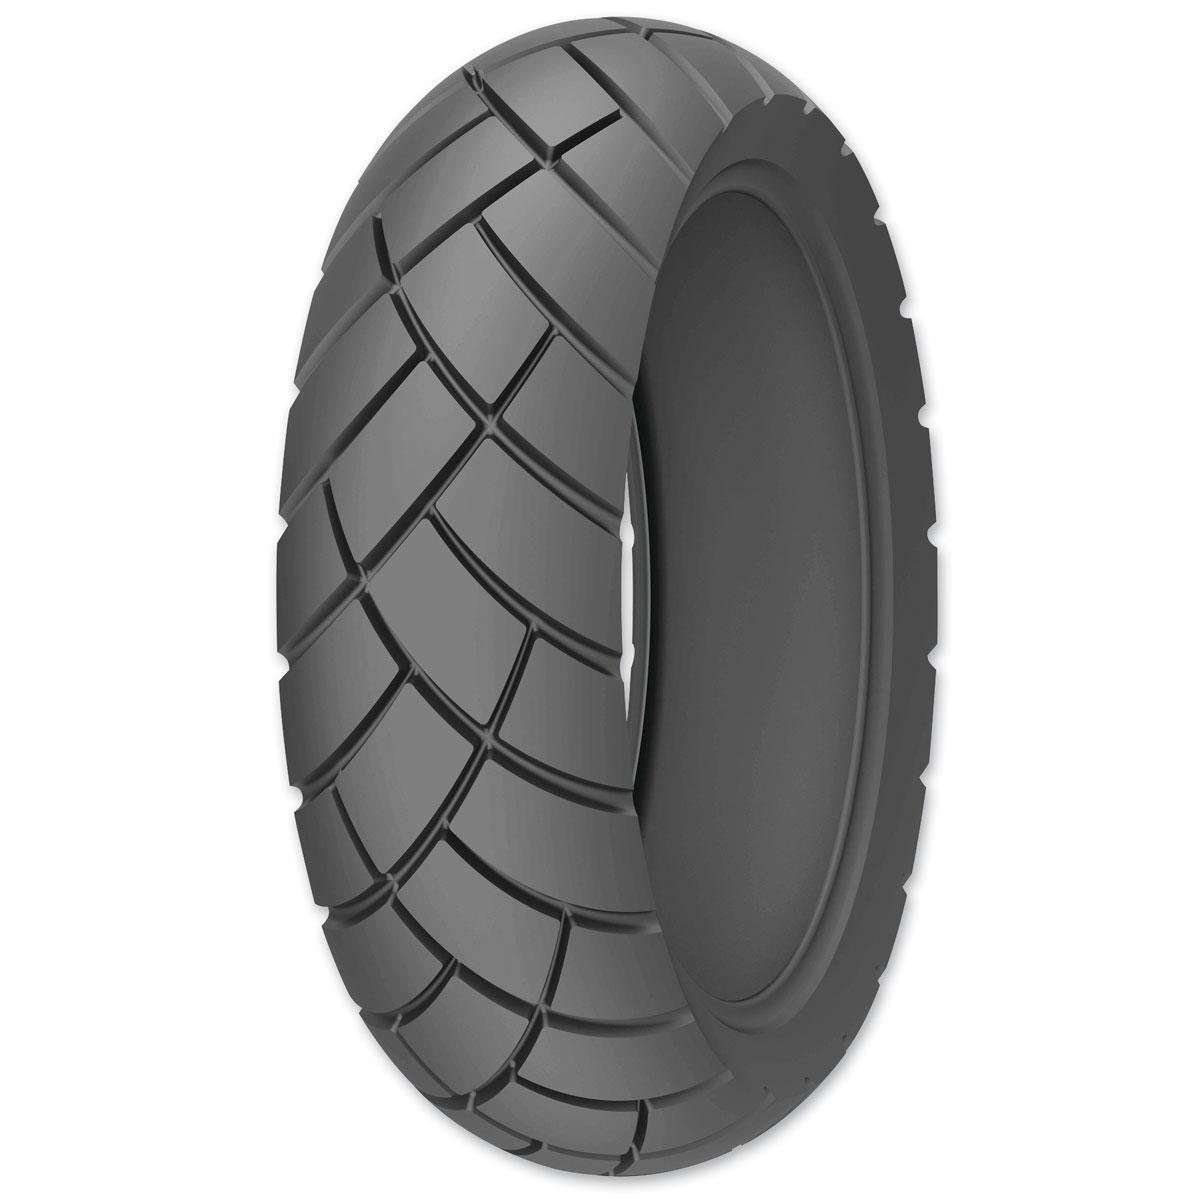 Kenda Tires K678 Paver 170/60B17 Rear Tire